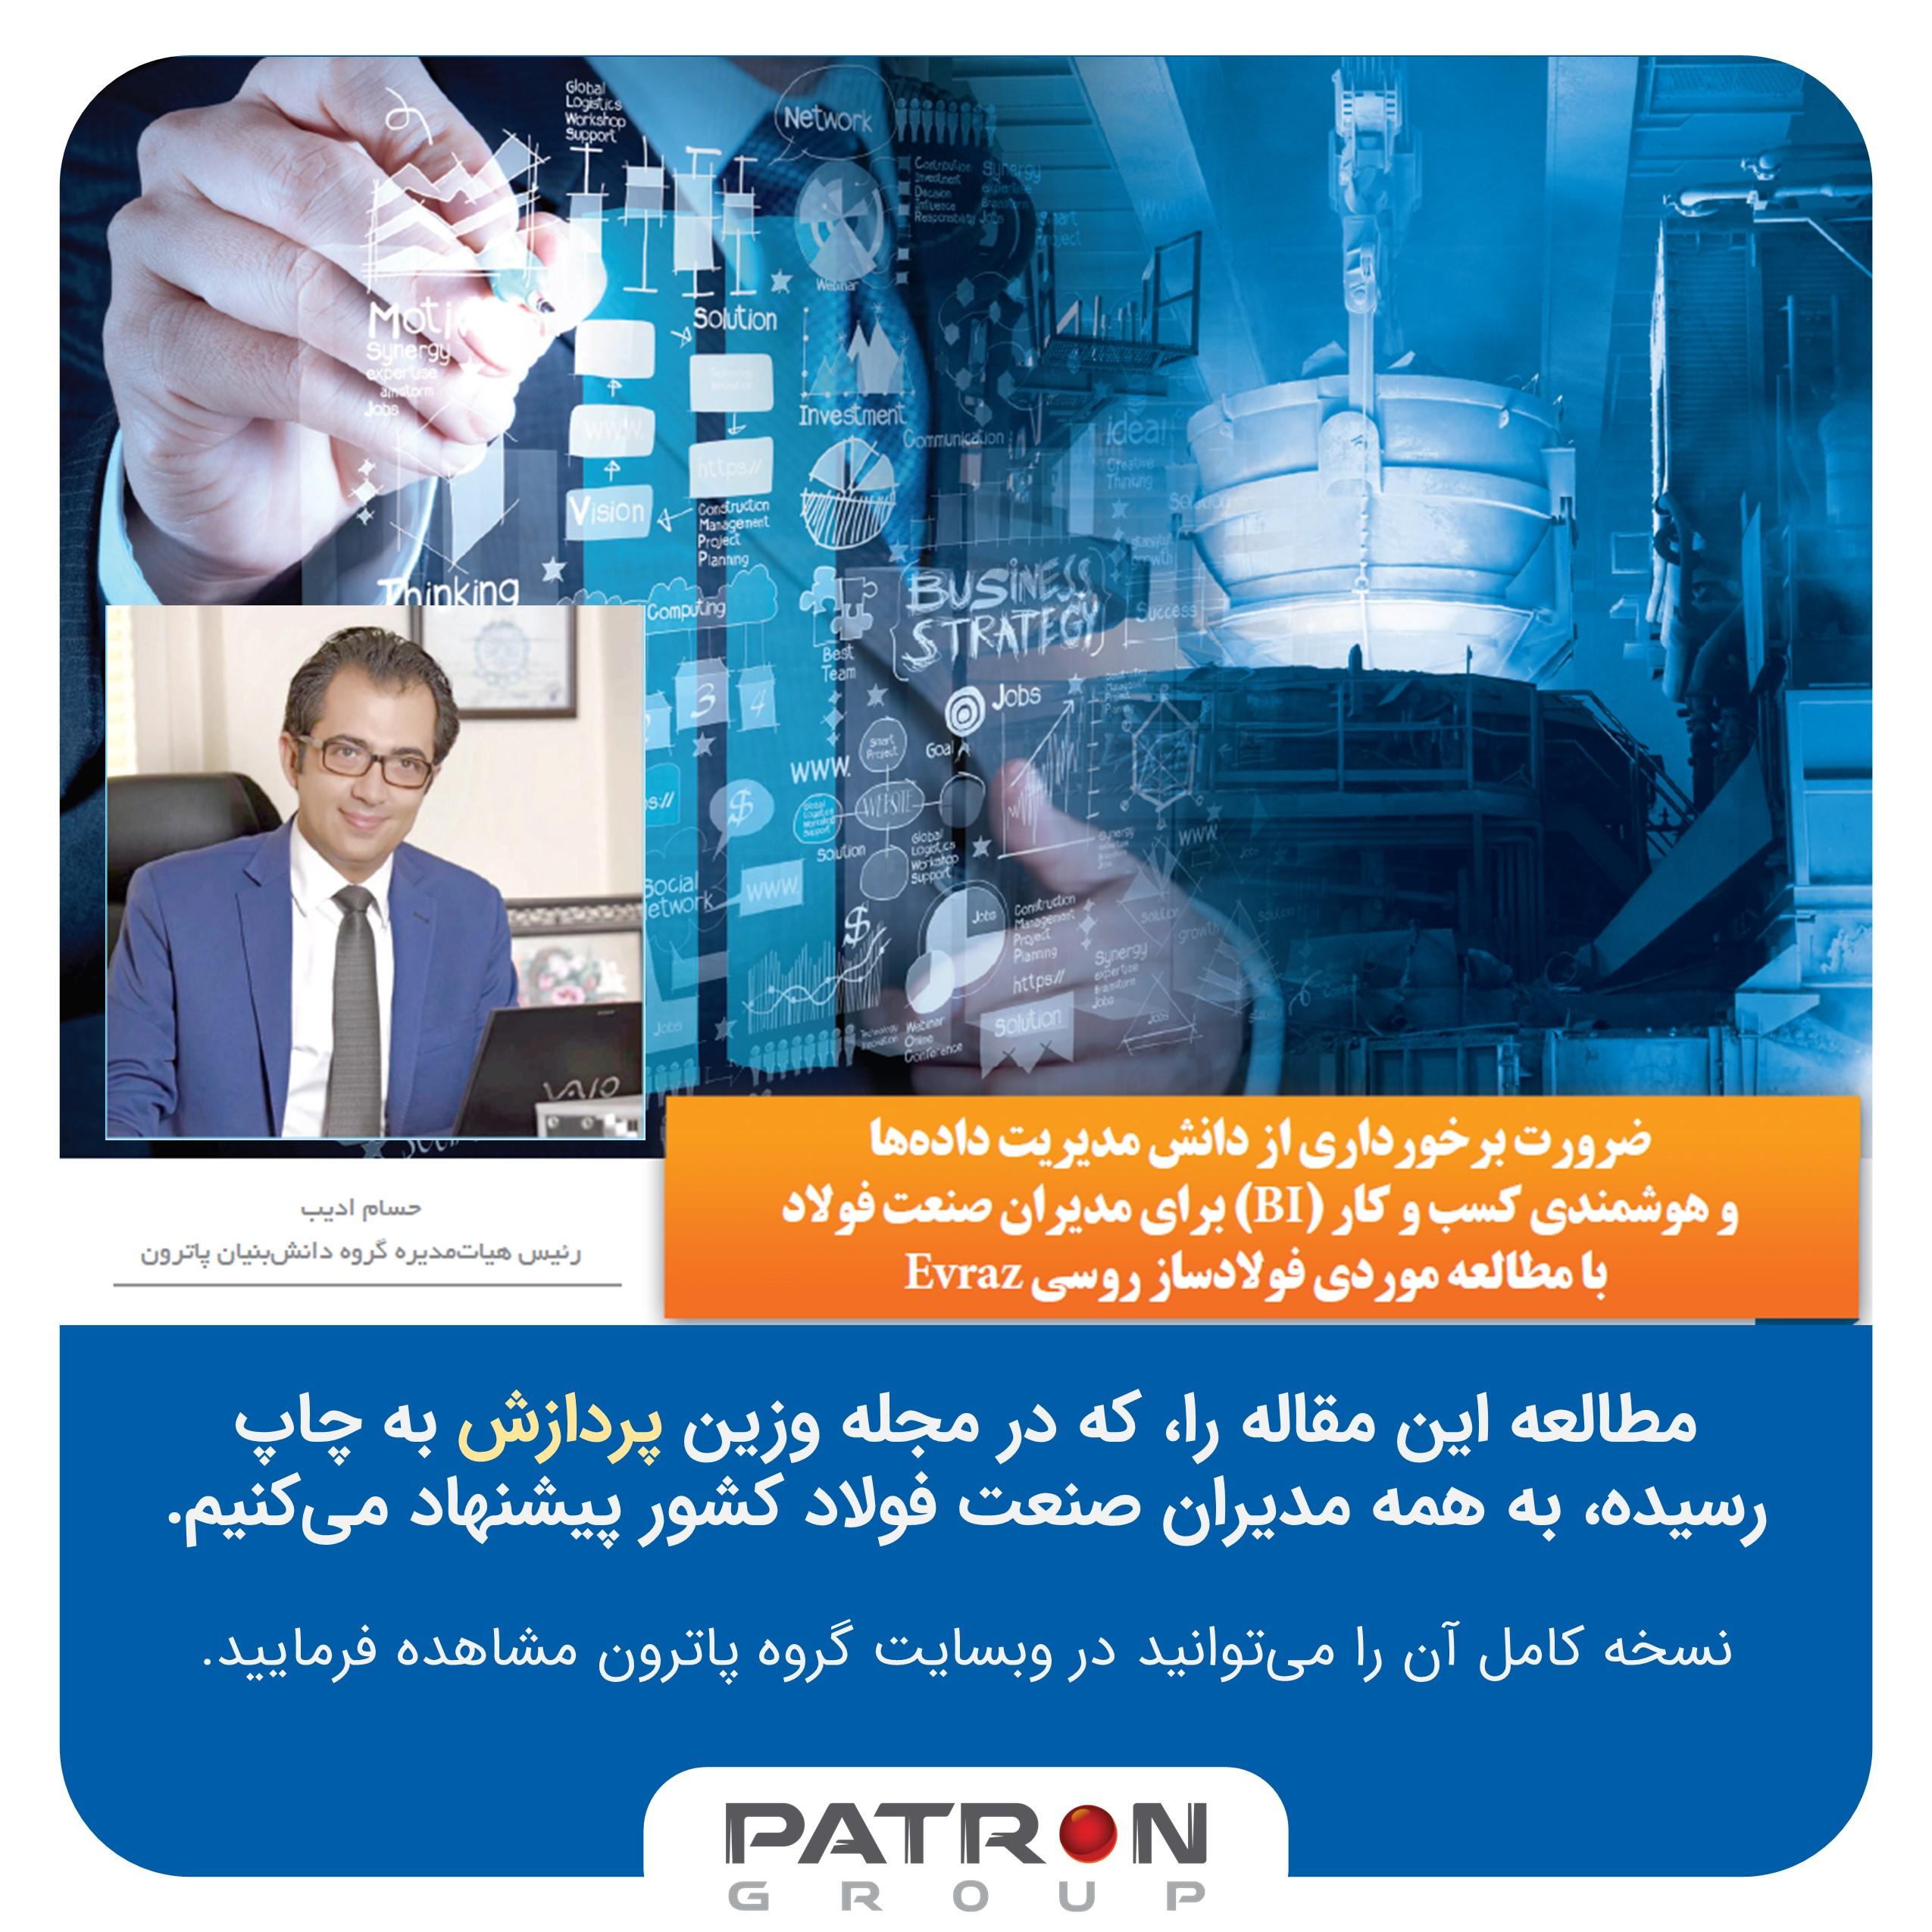 Patron 456 فولاد داده کاوی هوش کسب و کار تجاری